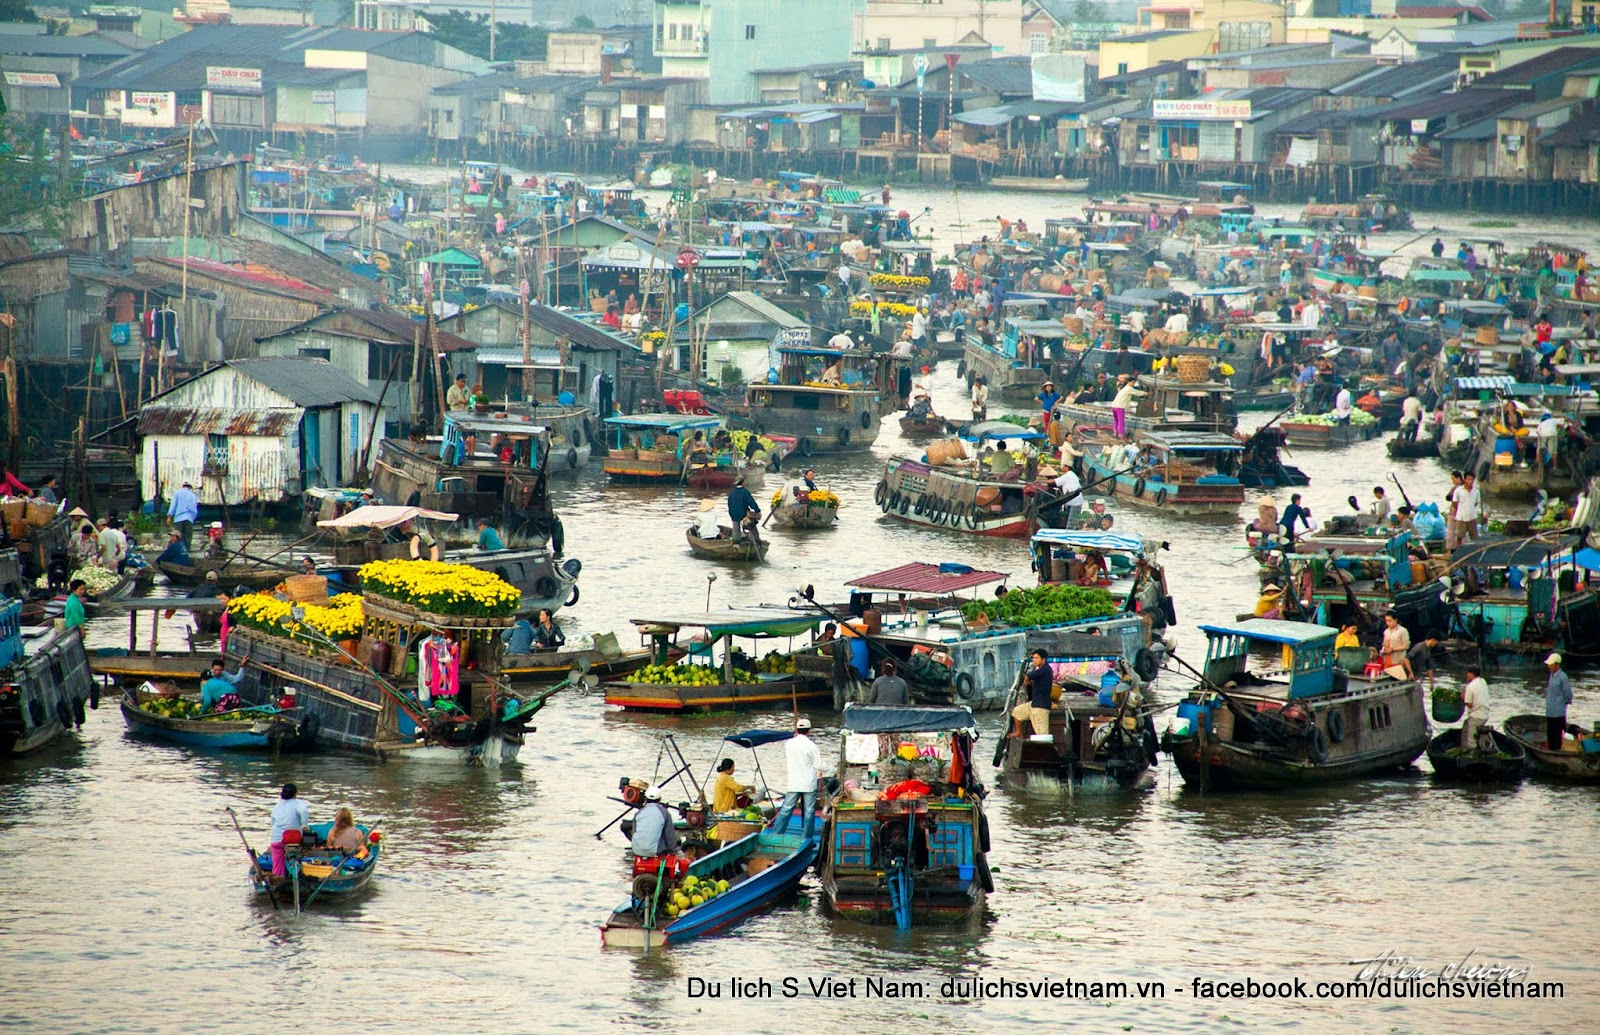 Mekong delta in top 10 best-value destination 2015